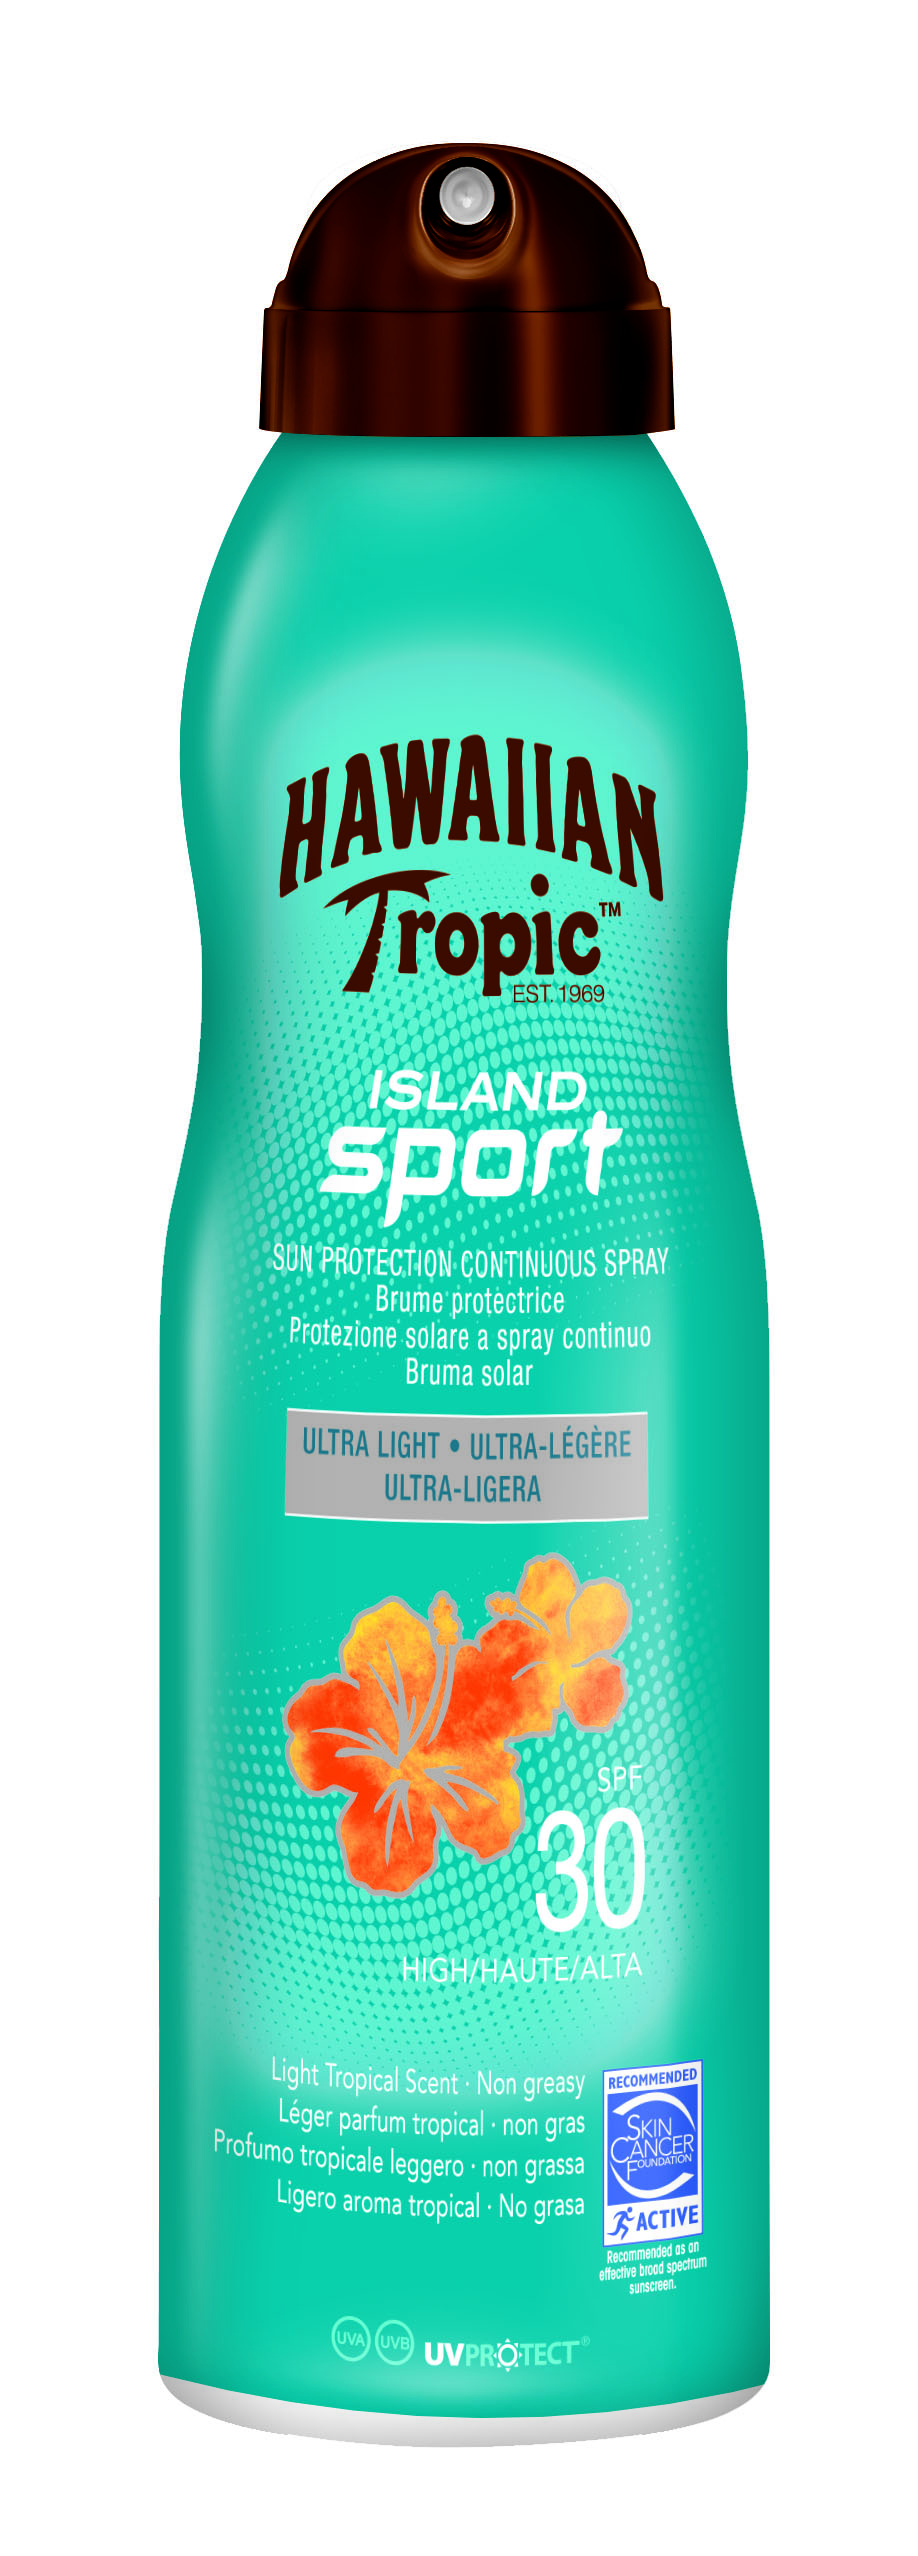 Island Sport Sun Protection Continuous Spray SPF 30 220ml